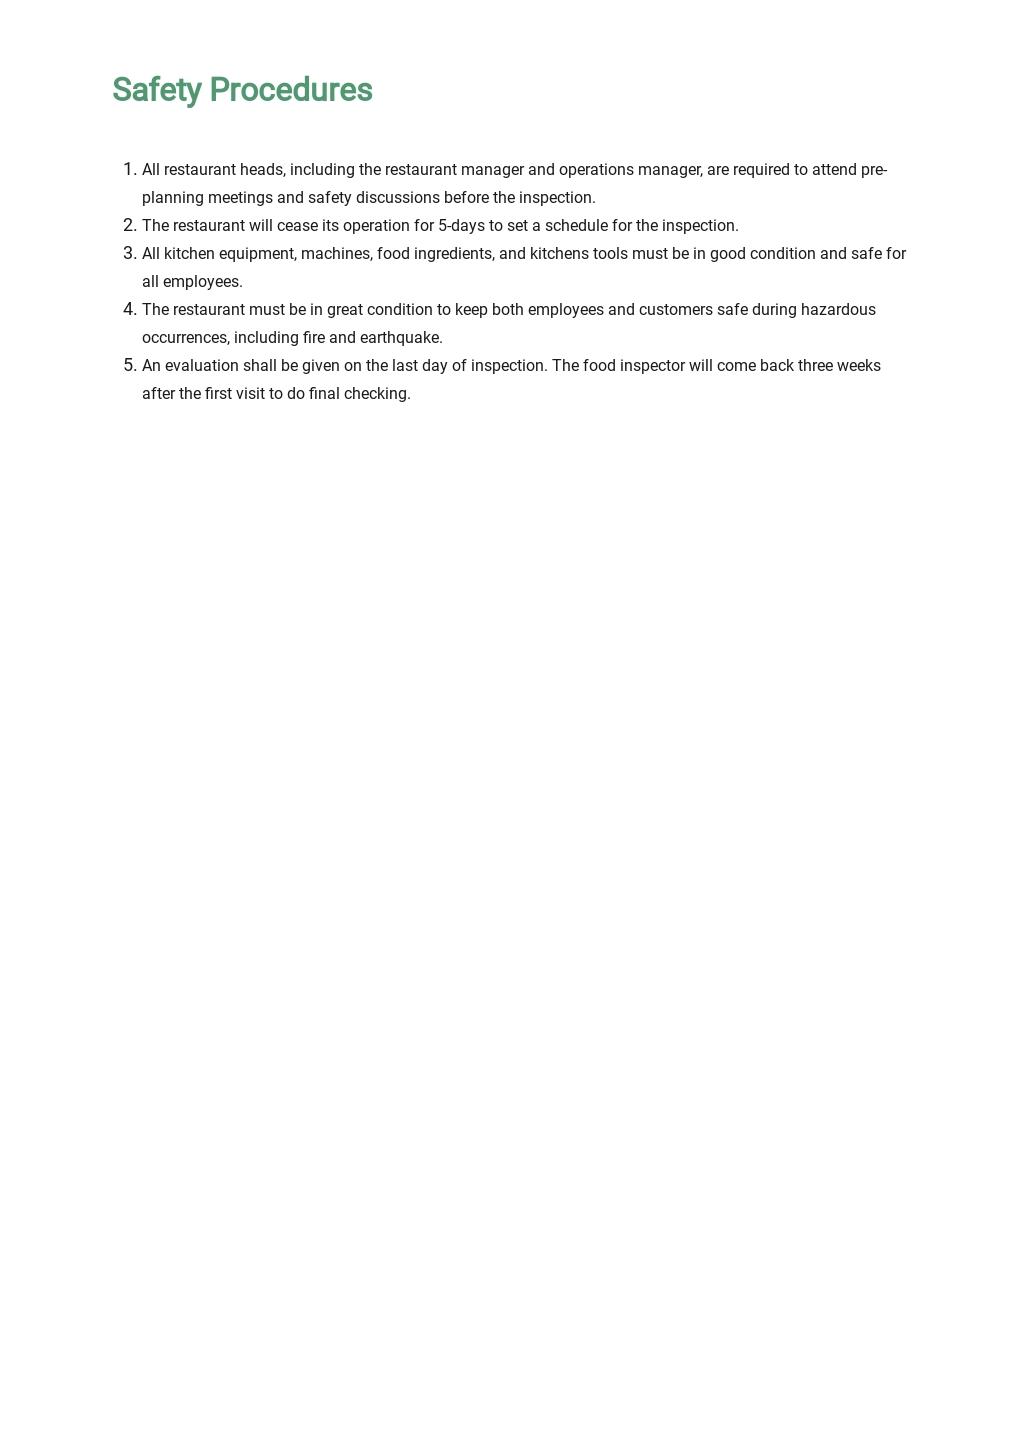 Restaurant Food Safety Plan Template 4.jpe